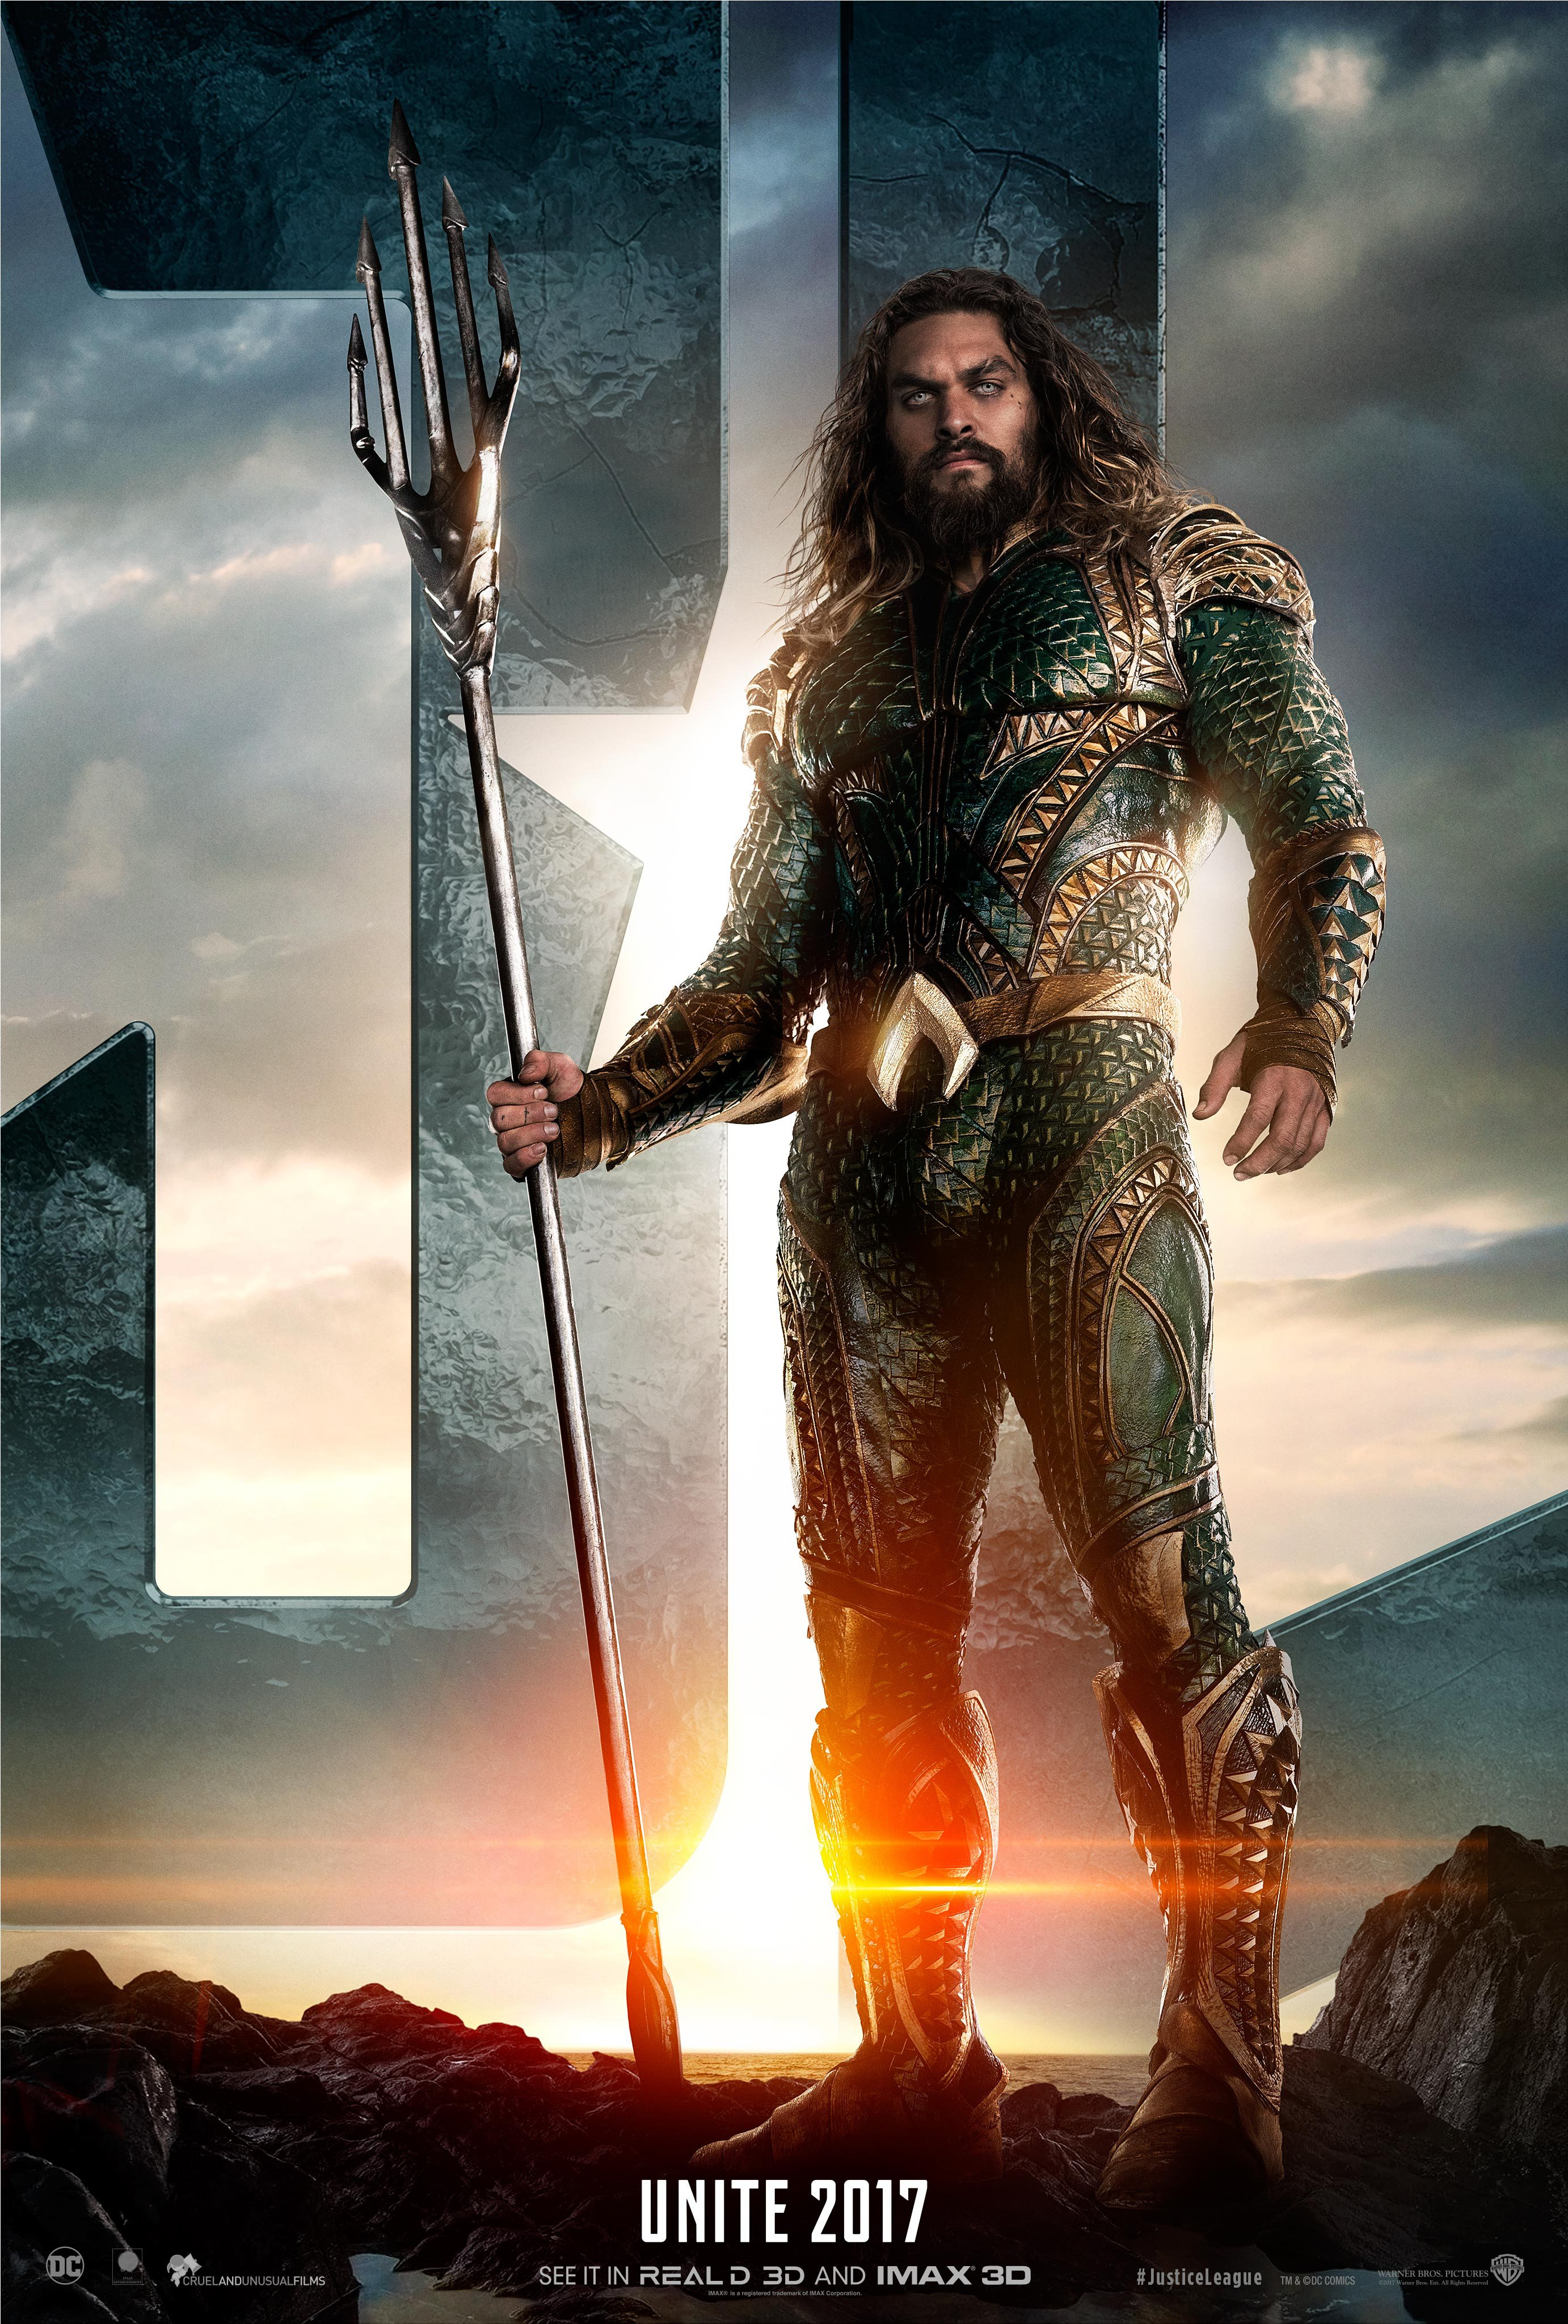 Justice League Movie images Justice League (2017) Poster - Jason Momoa as Aquaman HD wallpaper ...